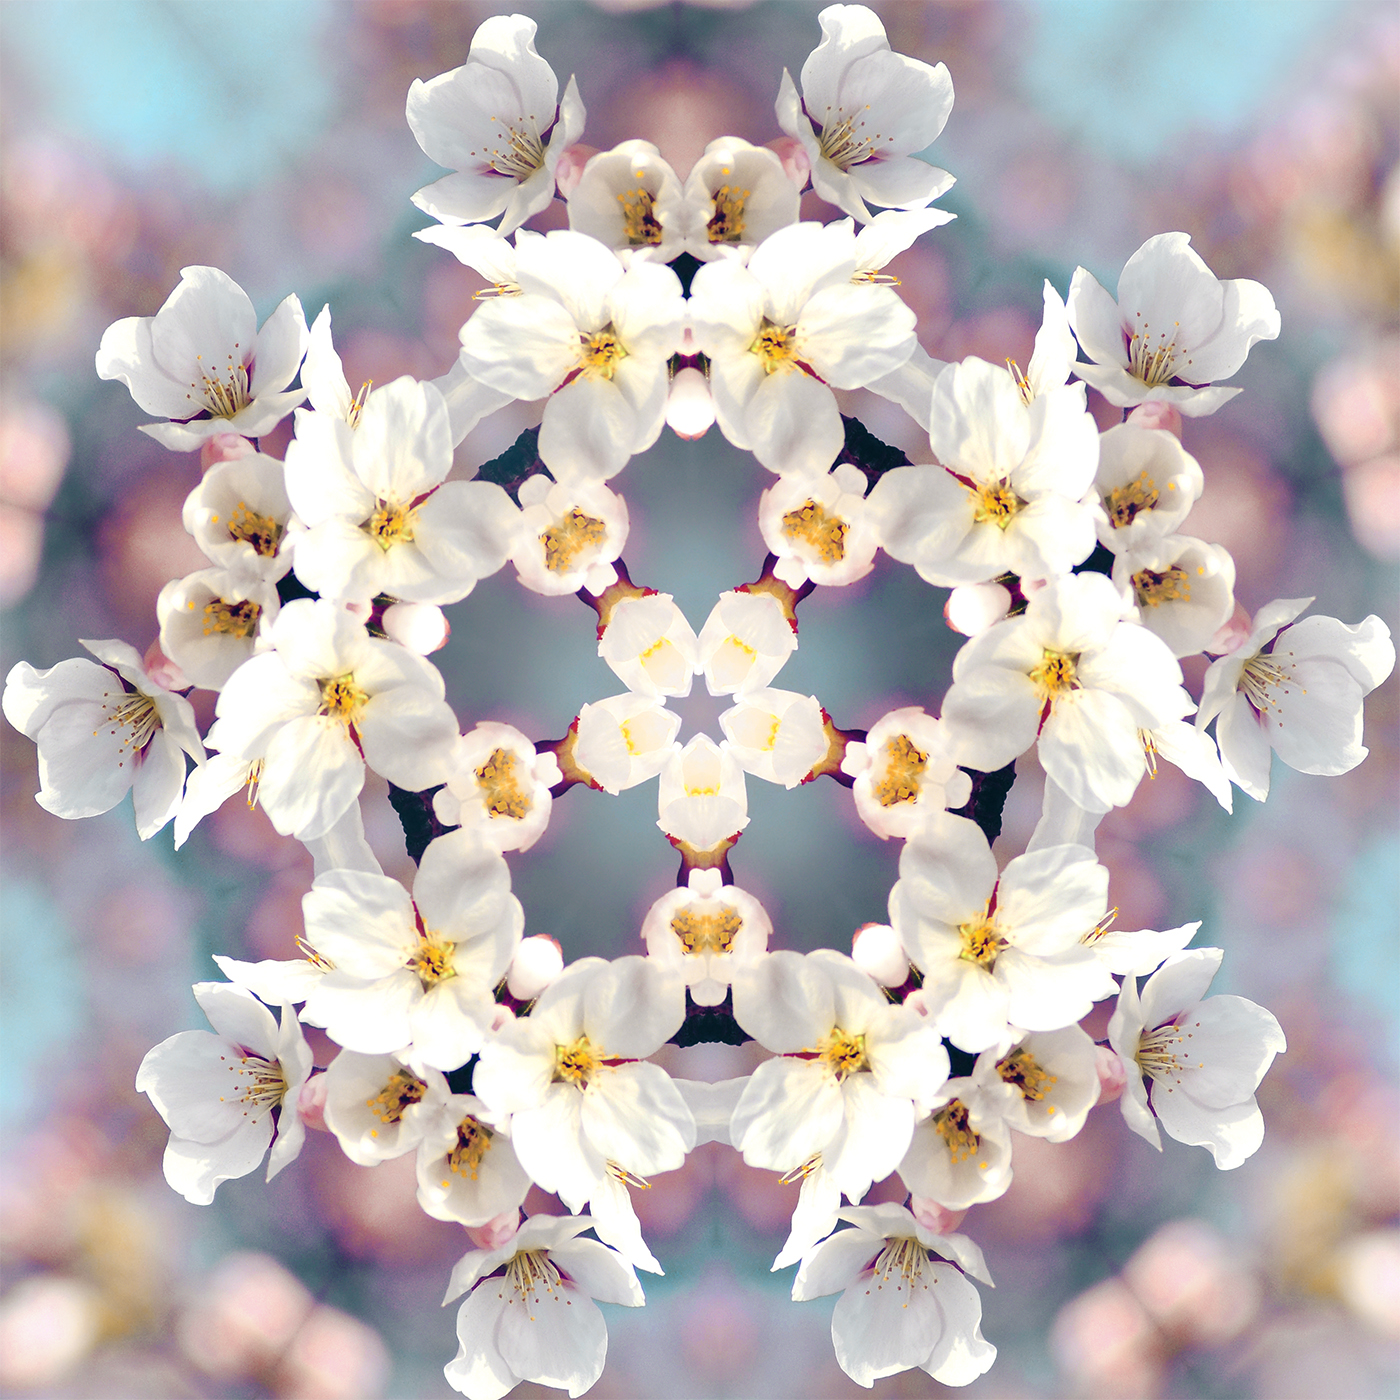 Cherry Blossom Kaleidoscope 3986772